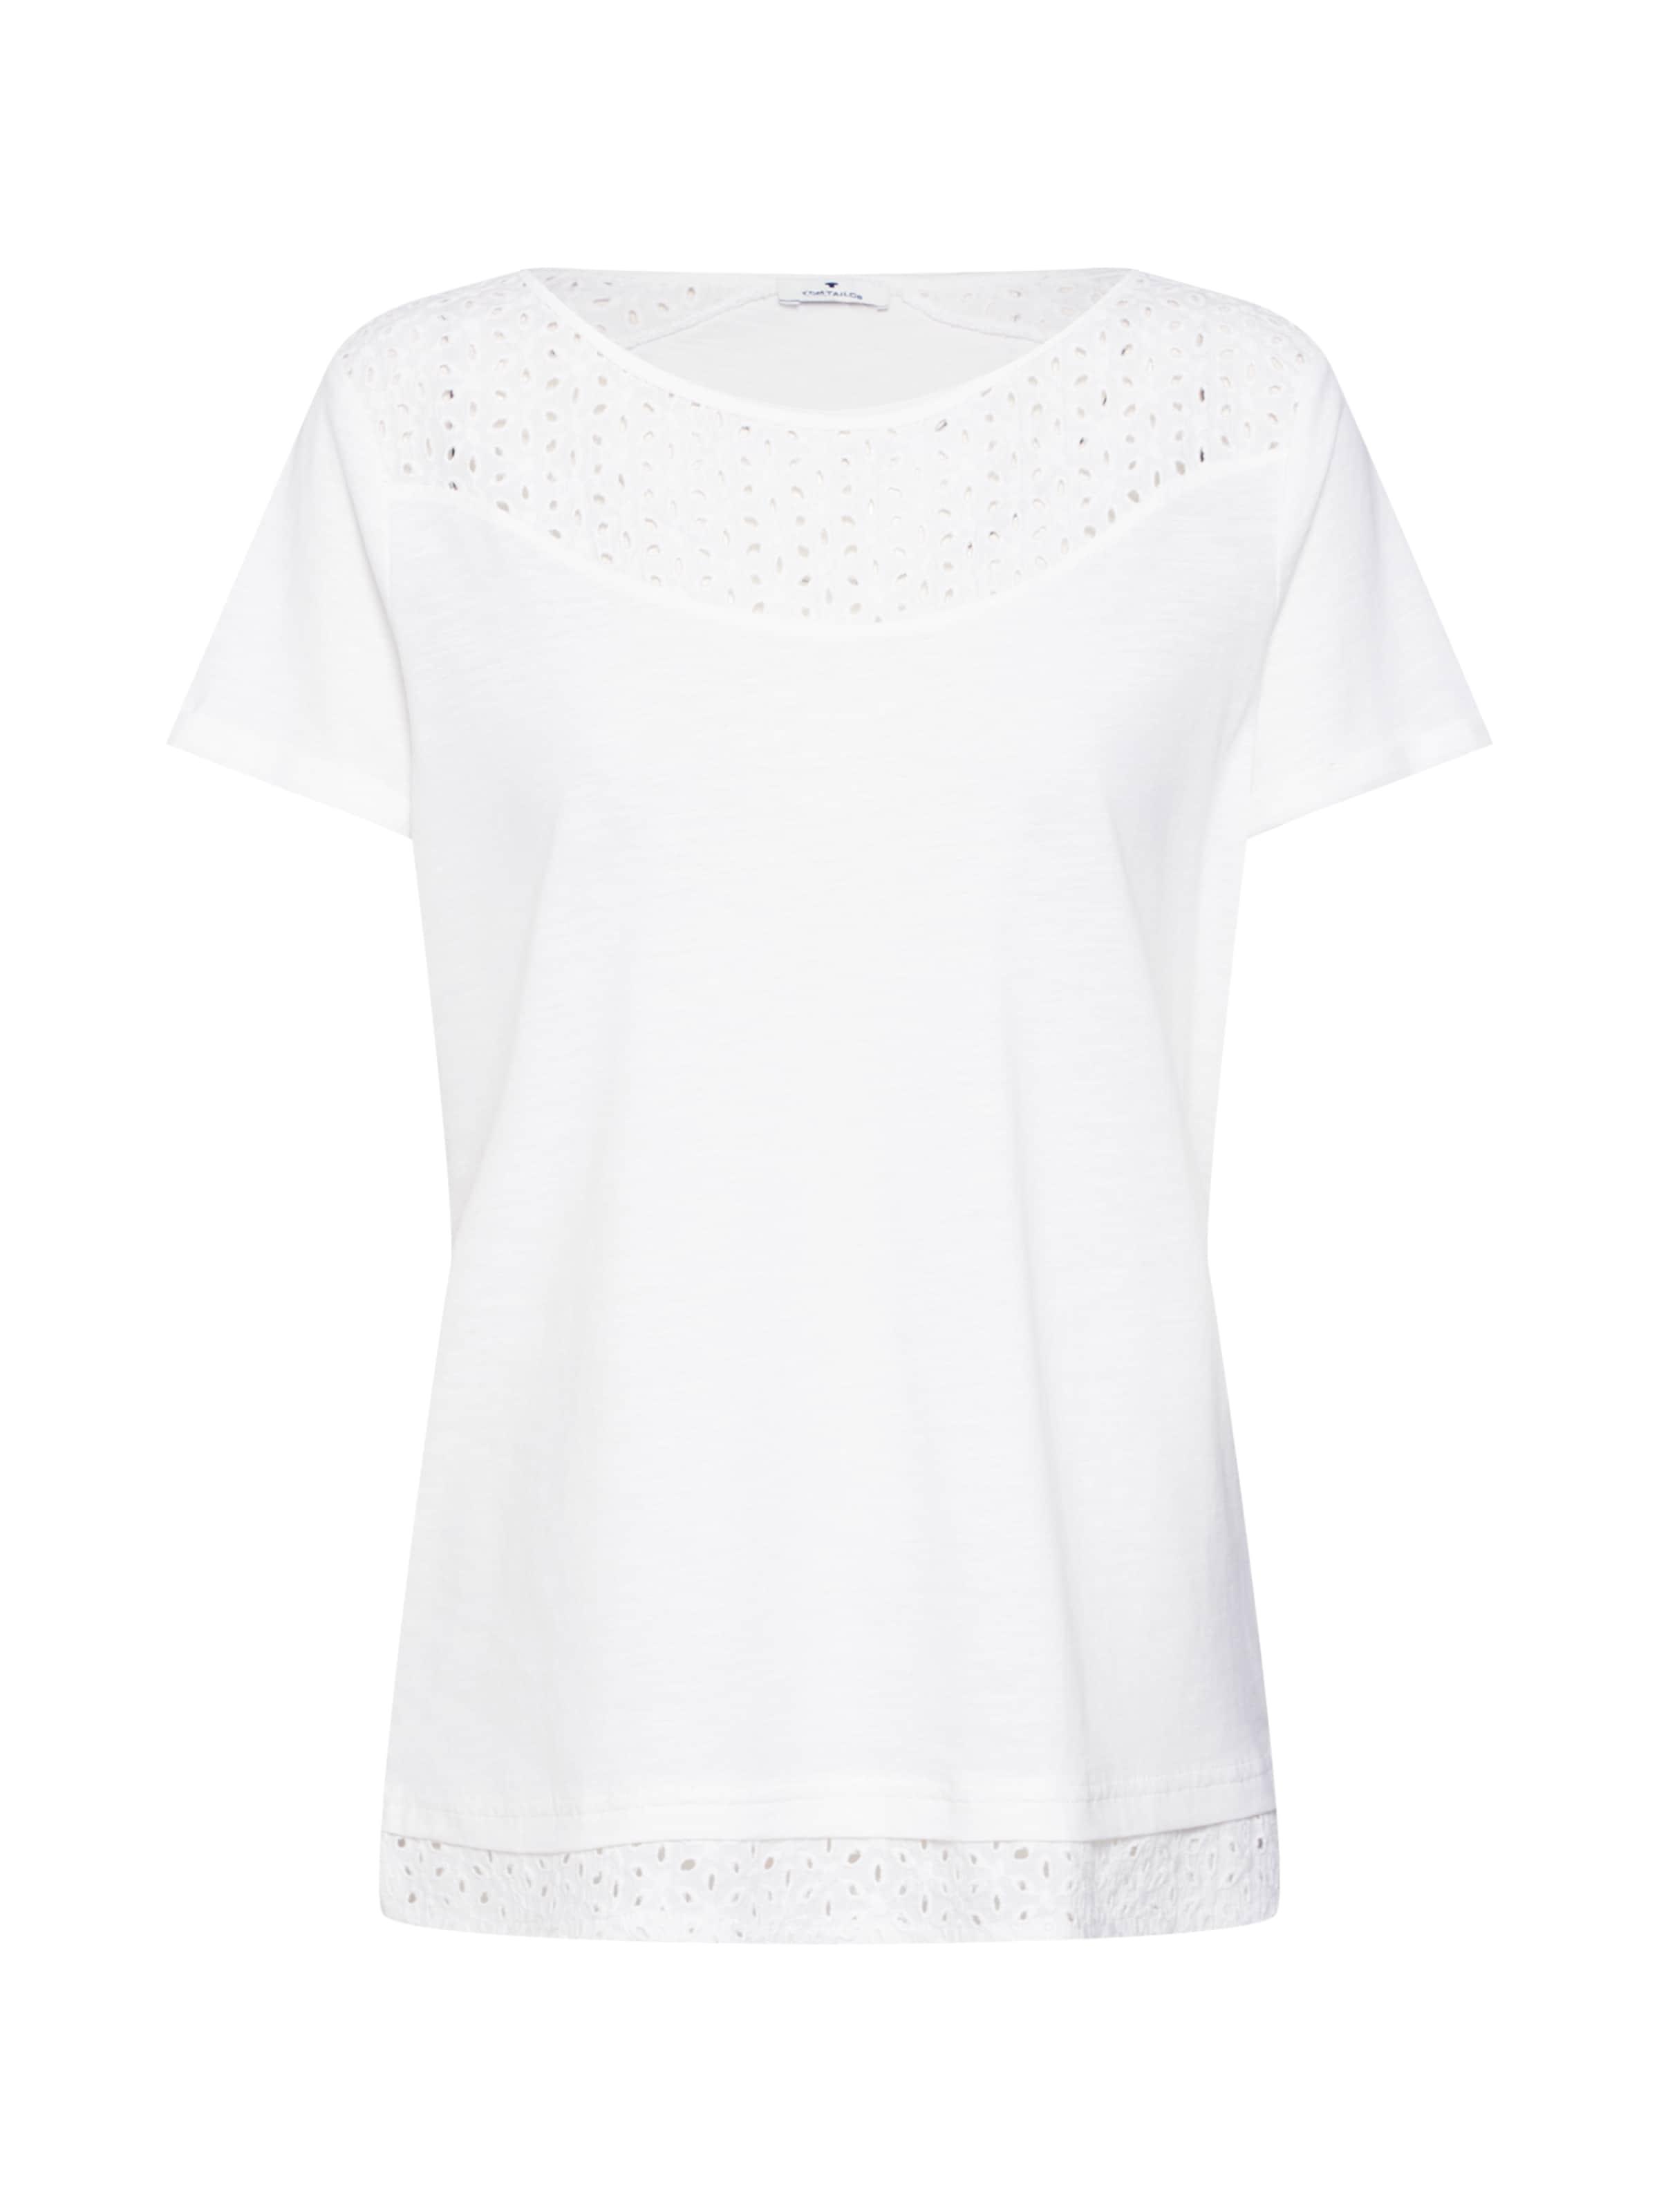 shirt En T Tailor Blanc Tom QCsrtxhd